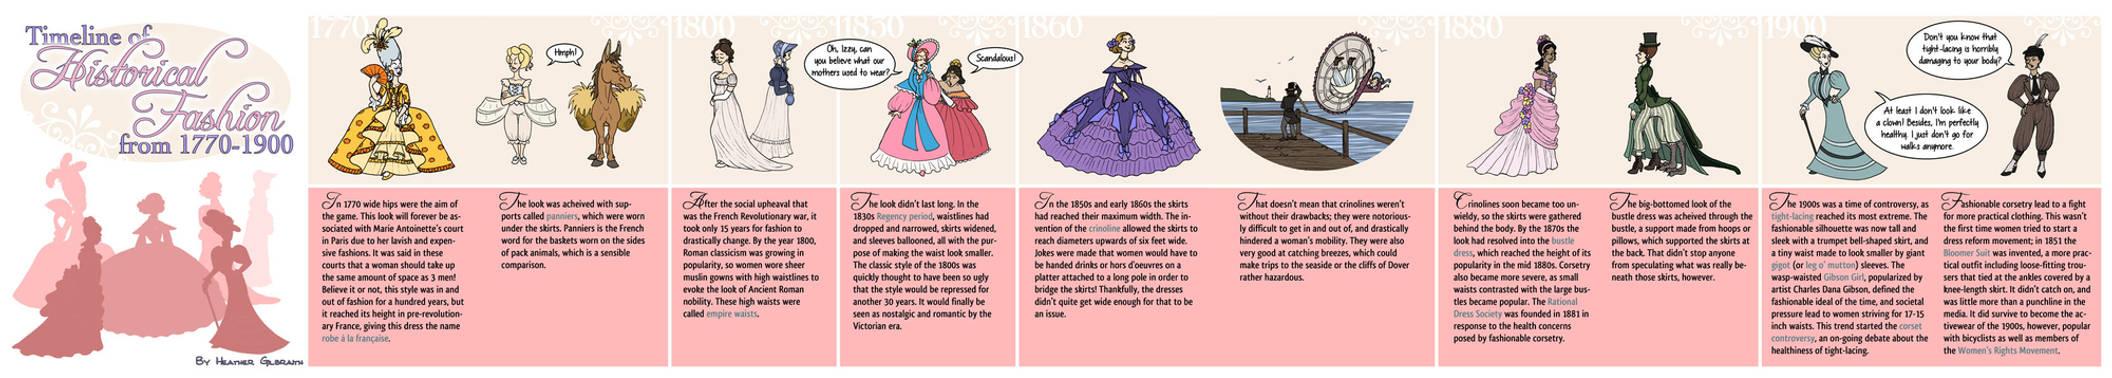 Timeline of Historical Fashion 1770 - 1900